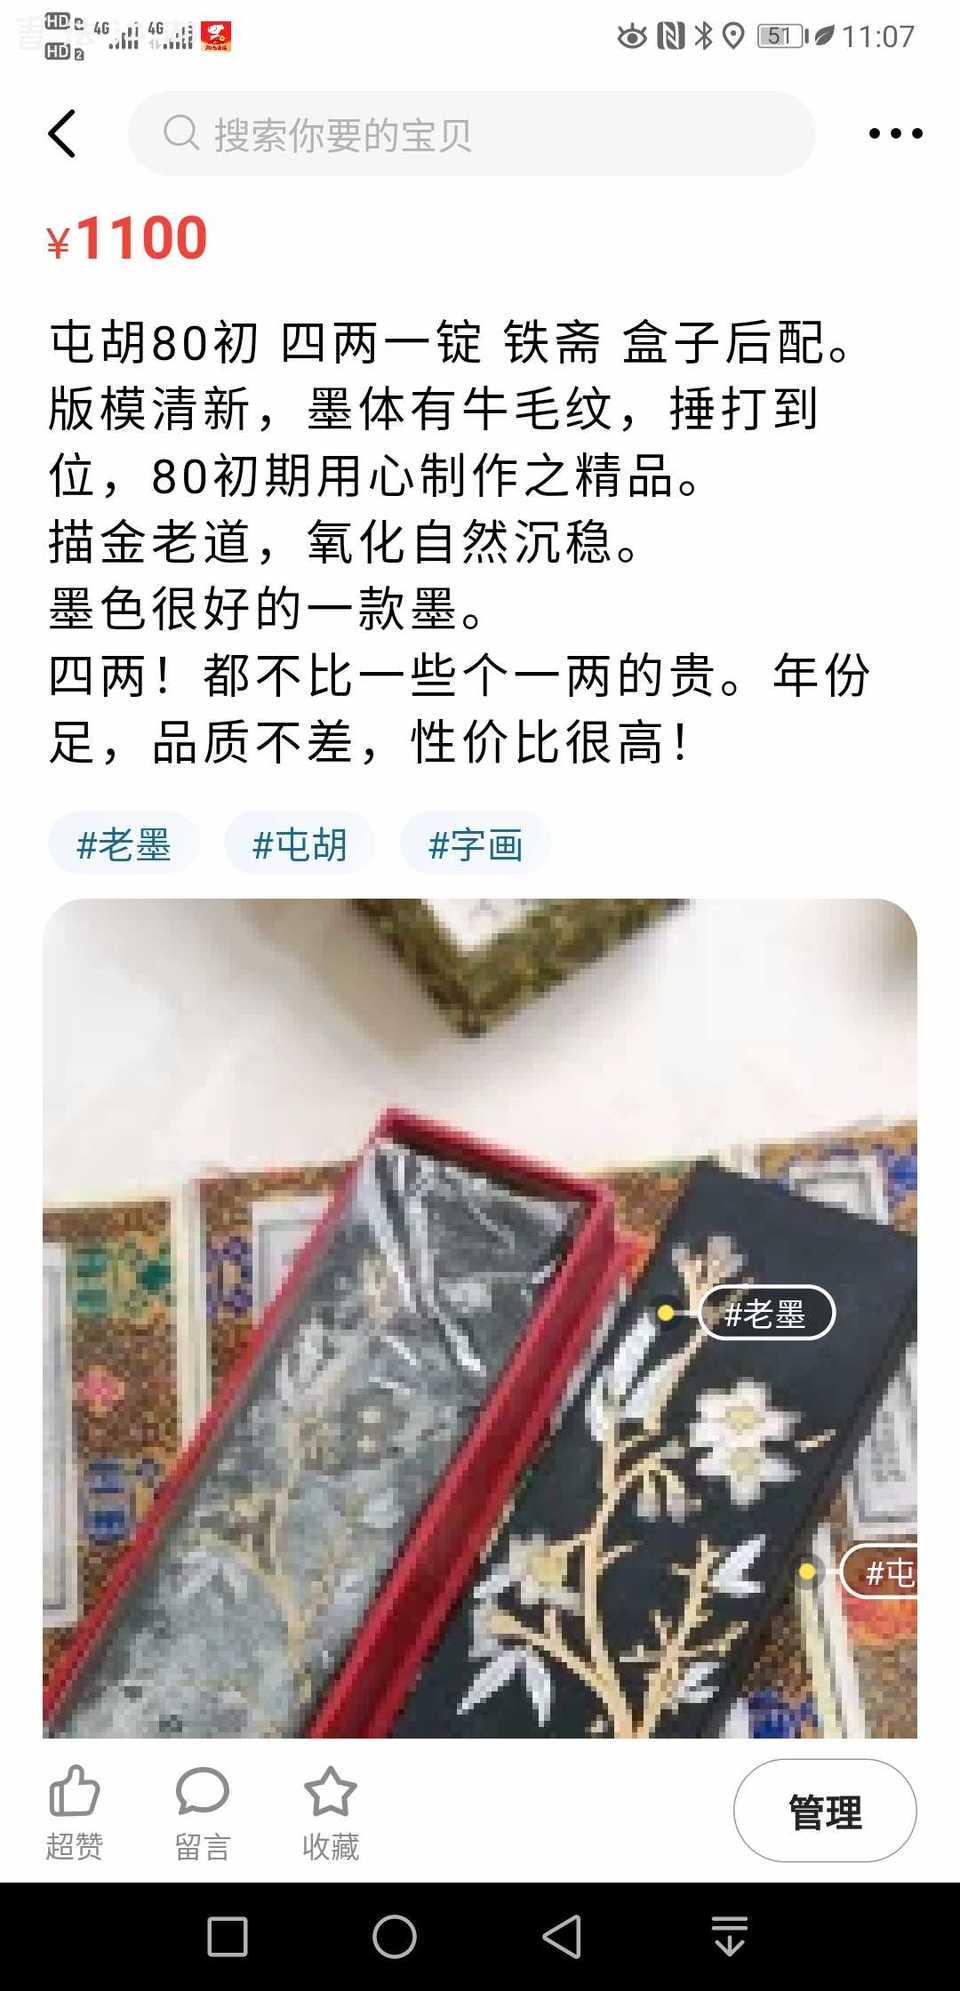 Screenshot_20200623_110730_com.taobao.idlefish.jpg